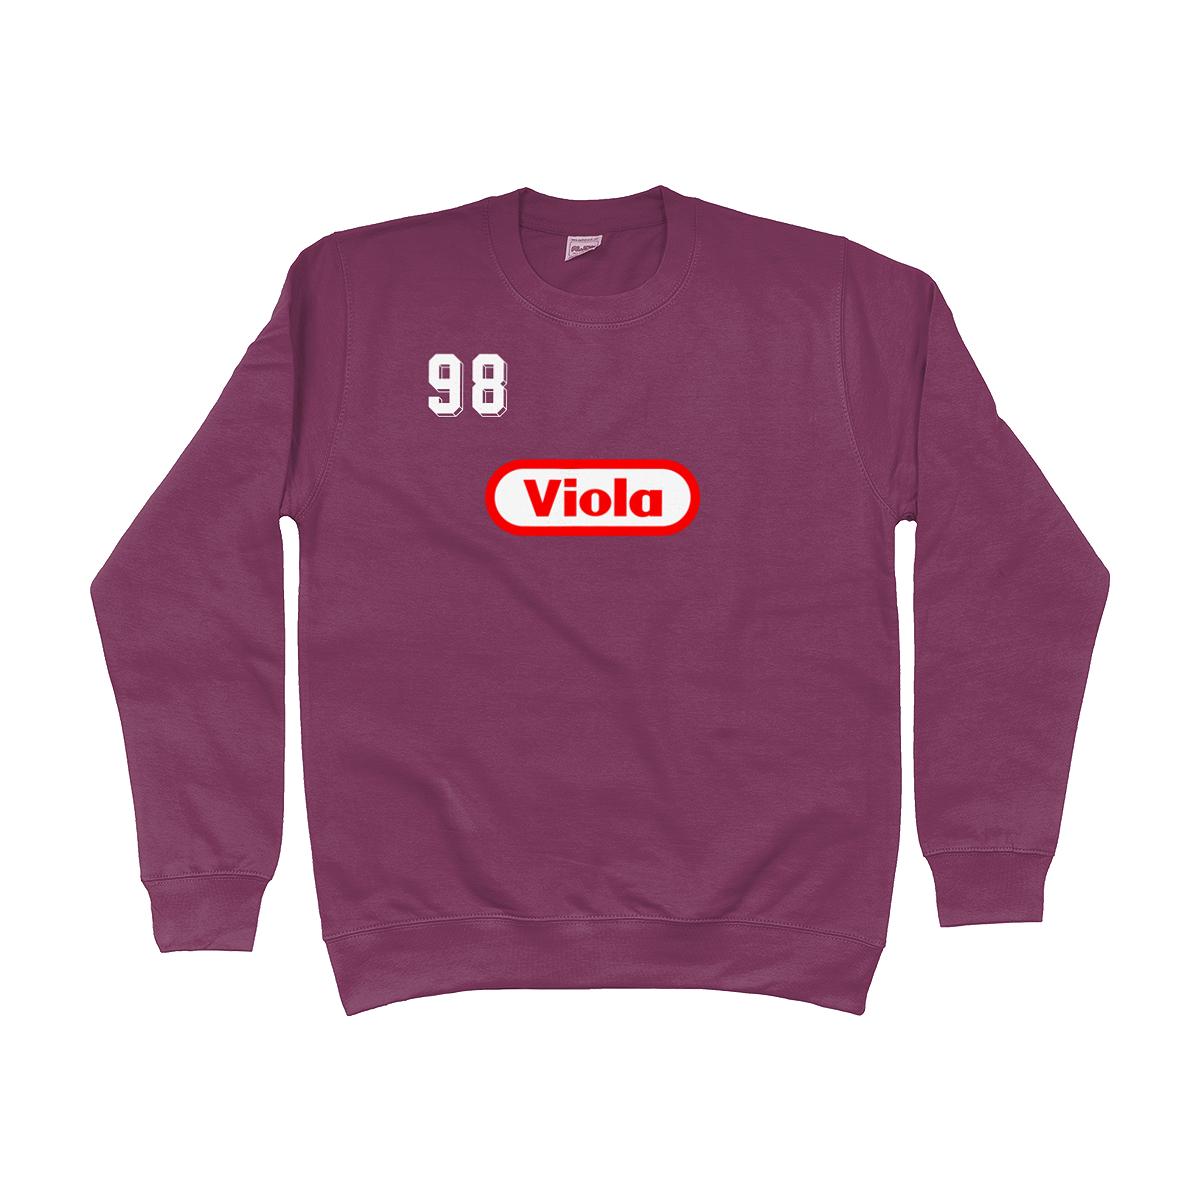 Fiorentina Viola 1998 Sweatshirt